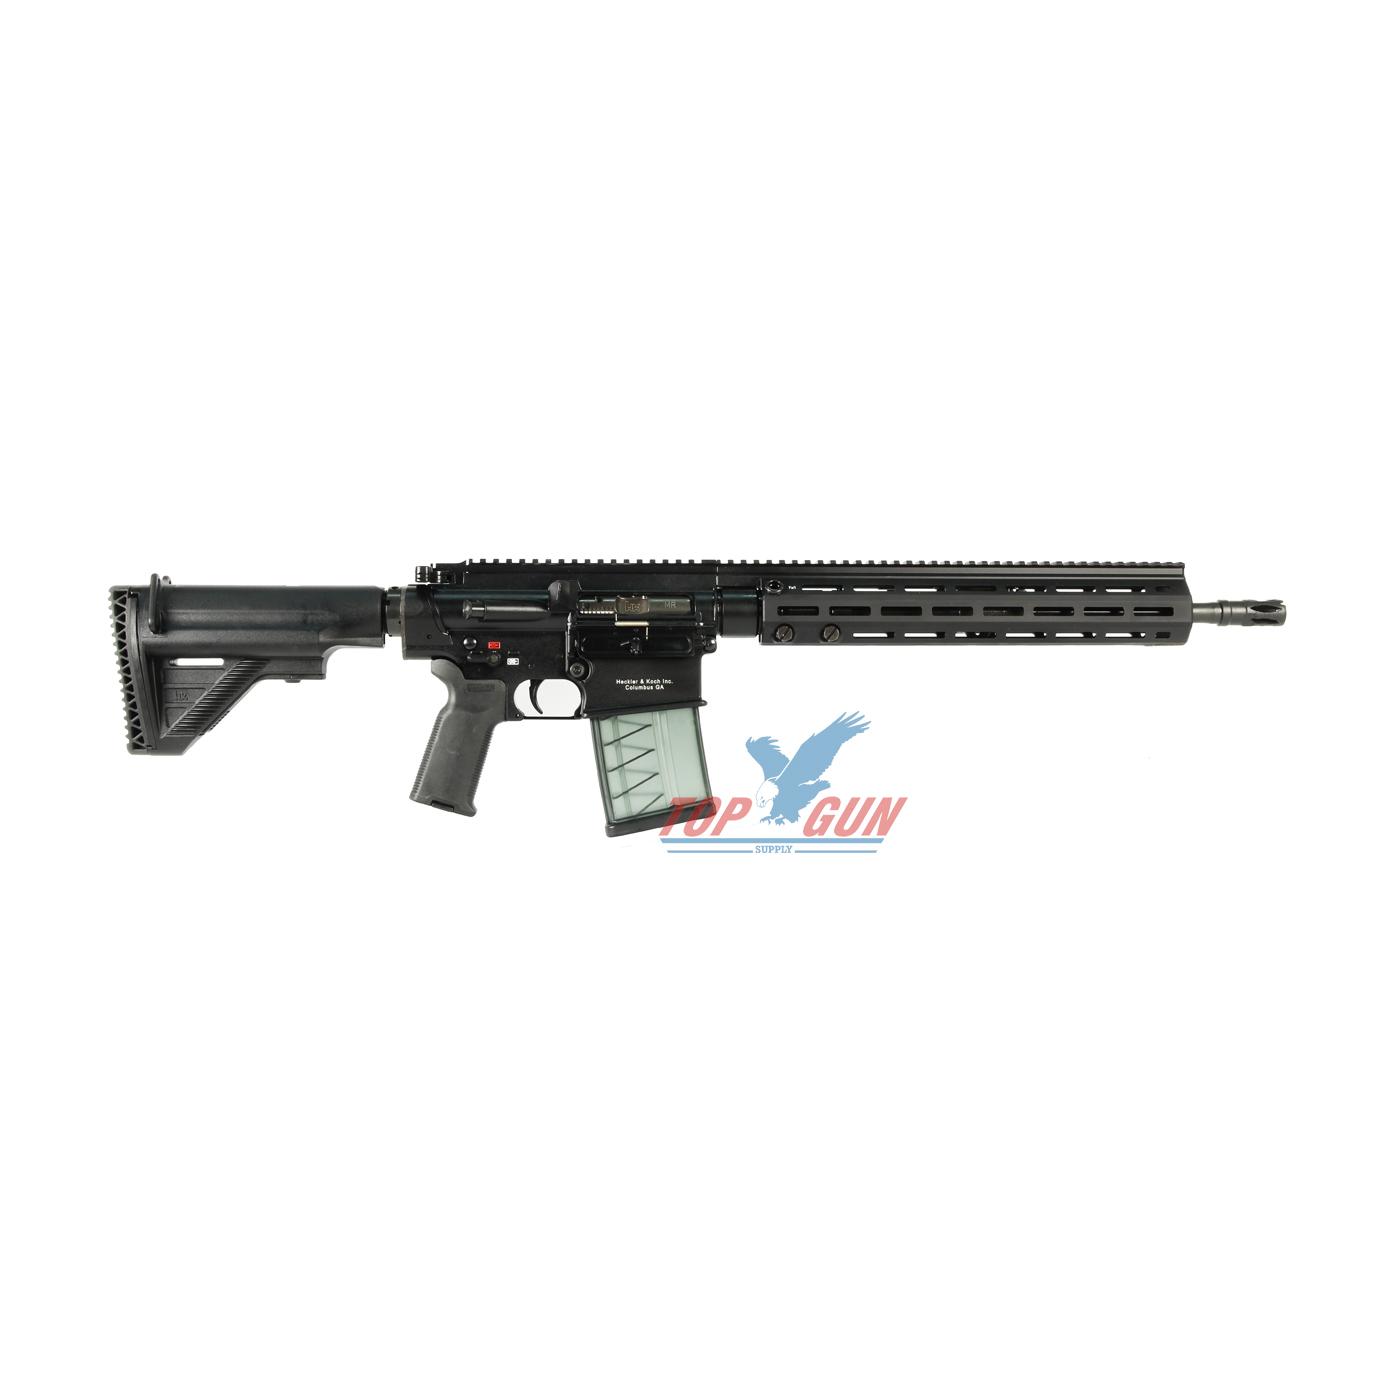 Heckler and Koch MR762 Rifle 7.62 x 51mm MLOK